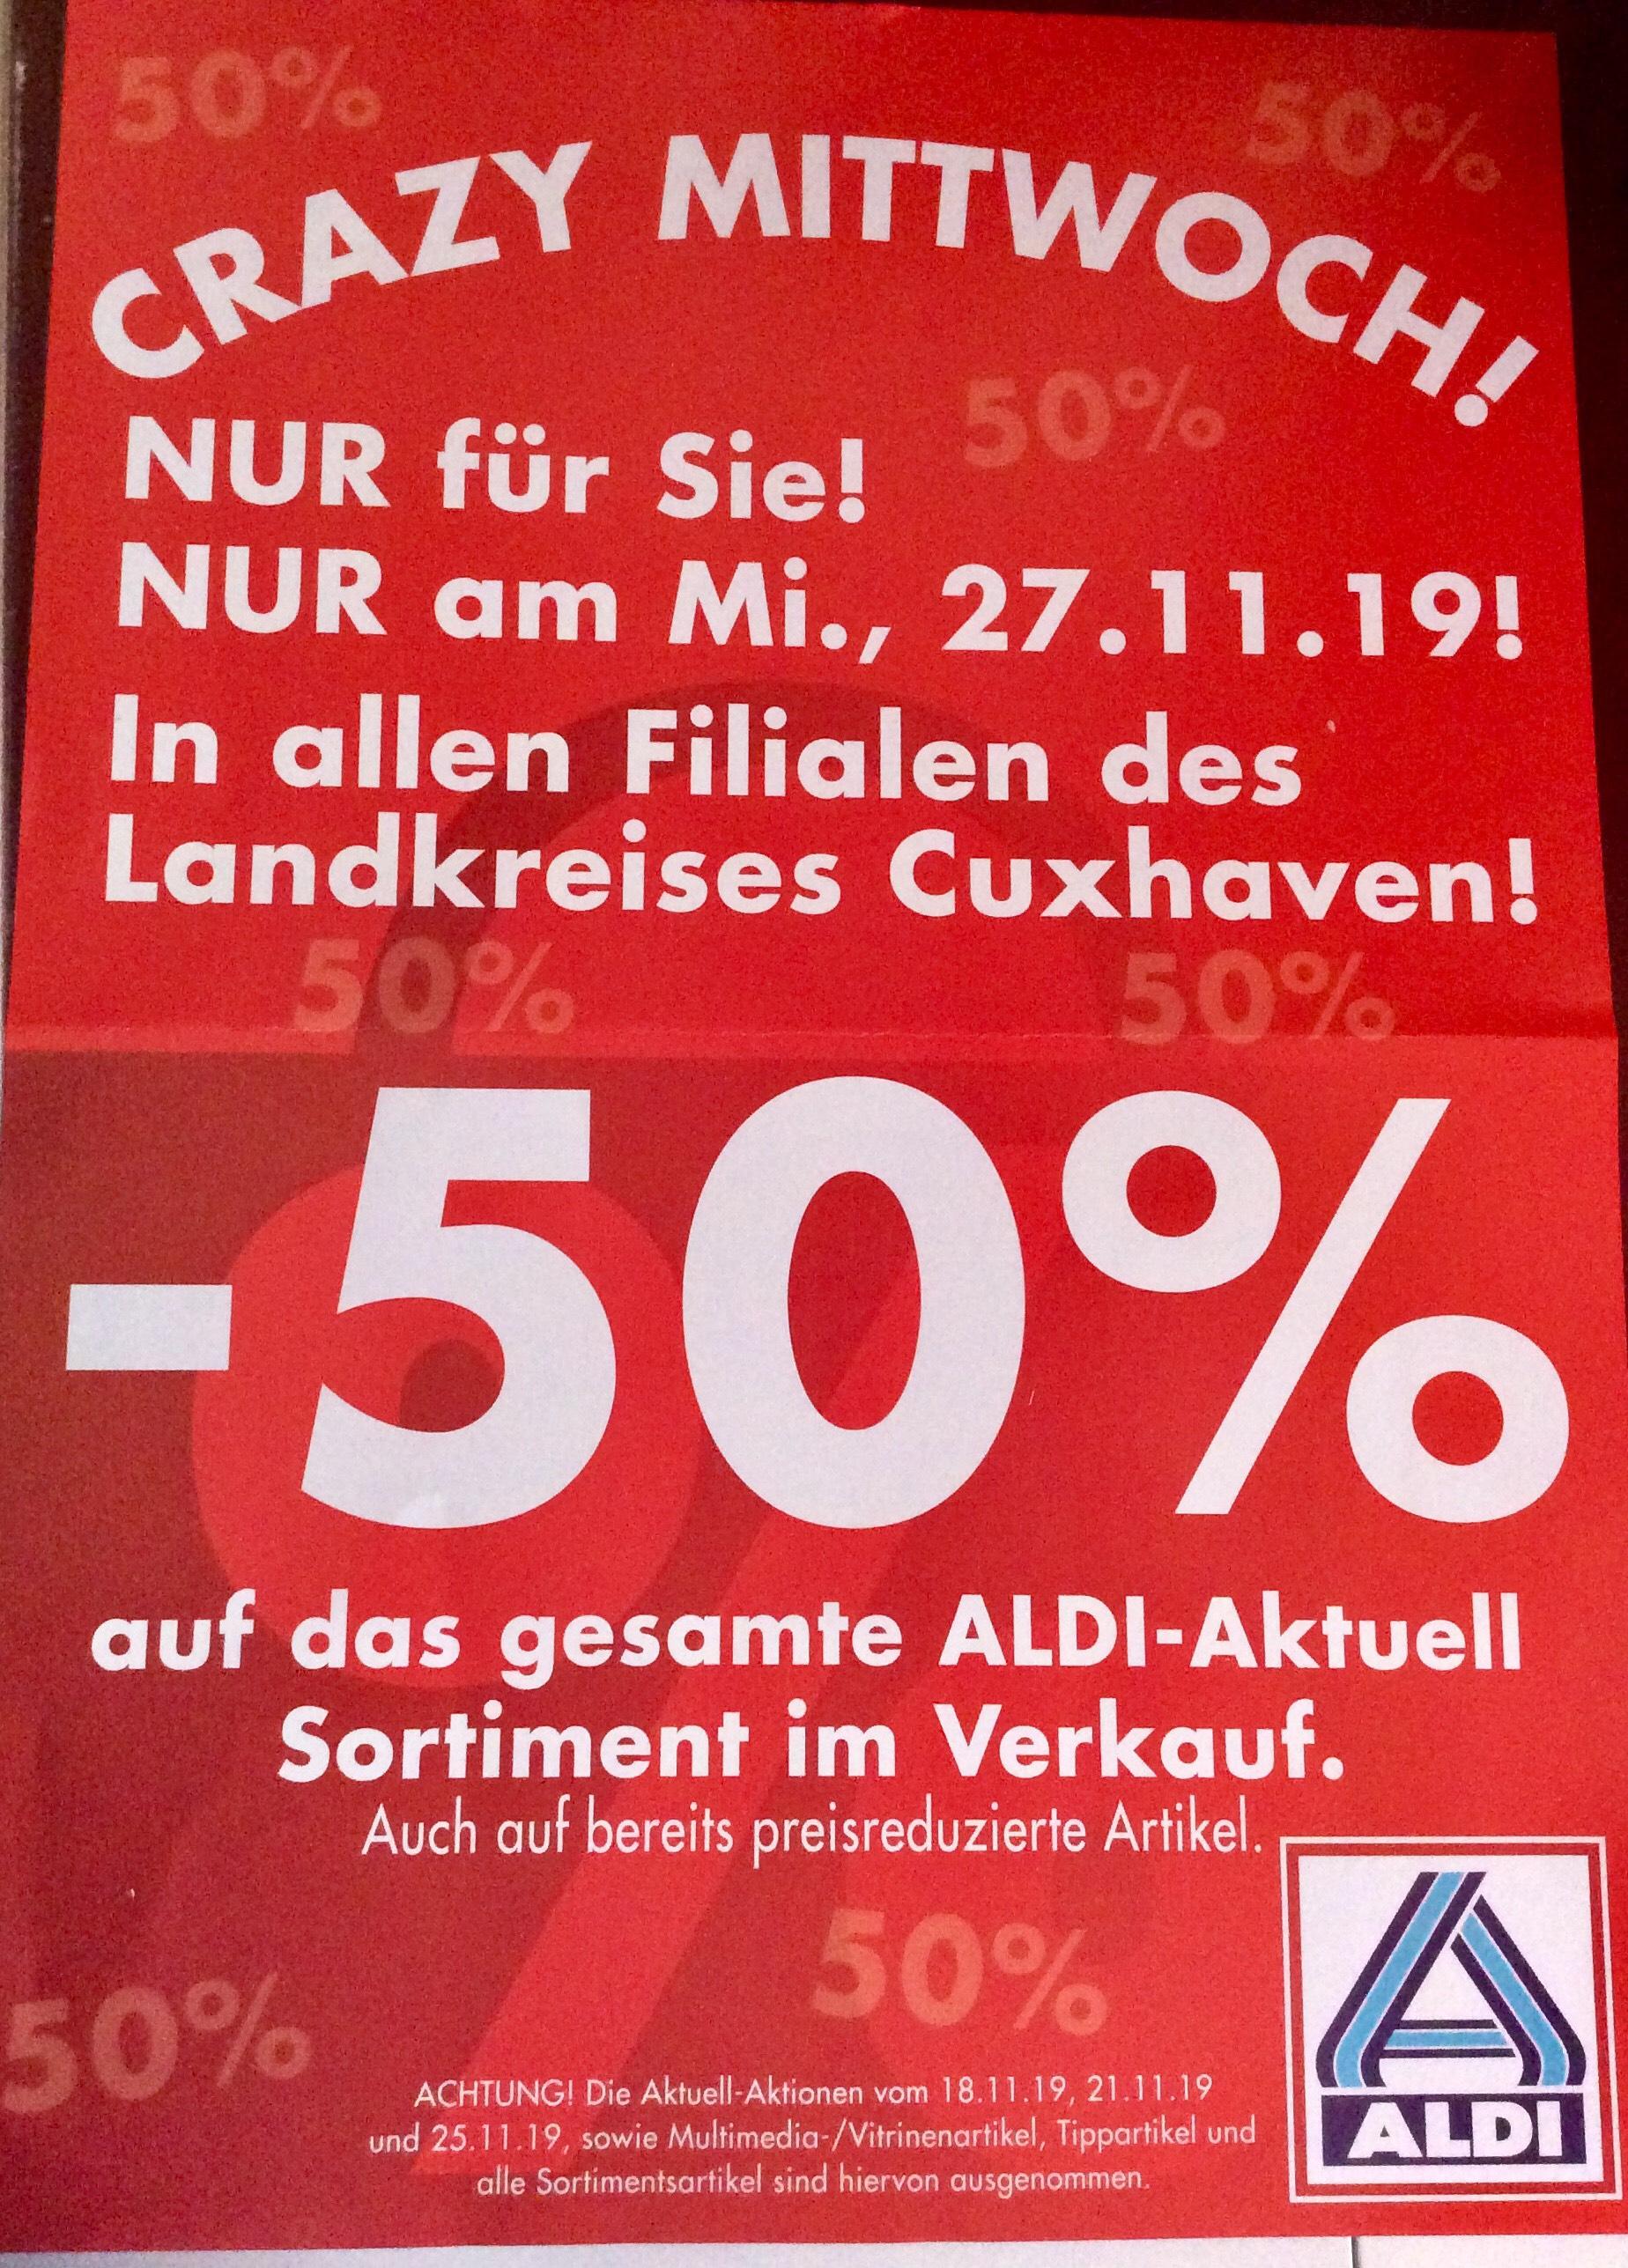 Lokal? LK Cuxhaven 50% Rabatt Aldi am 27.11.2019